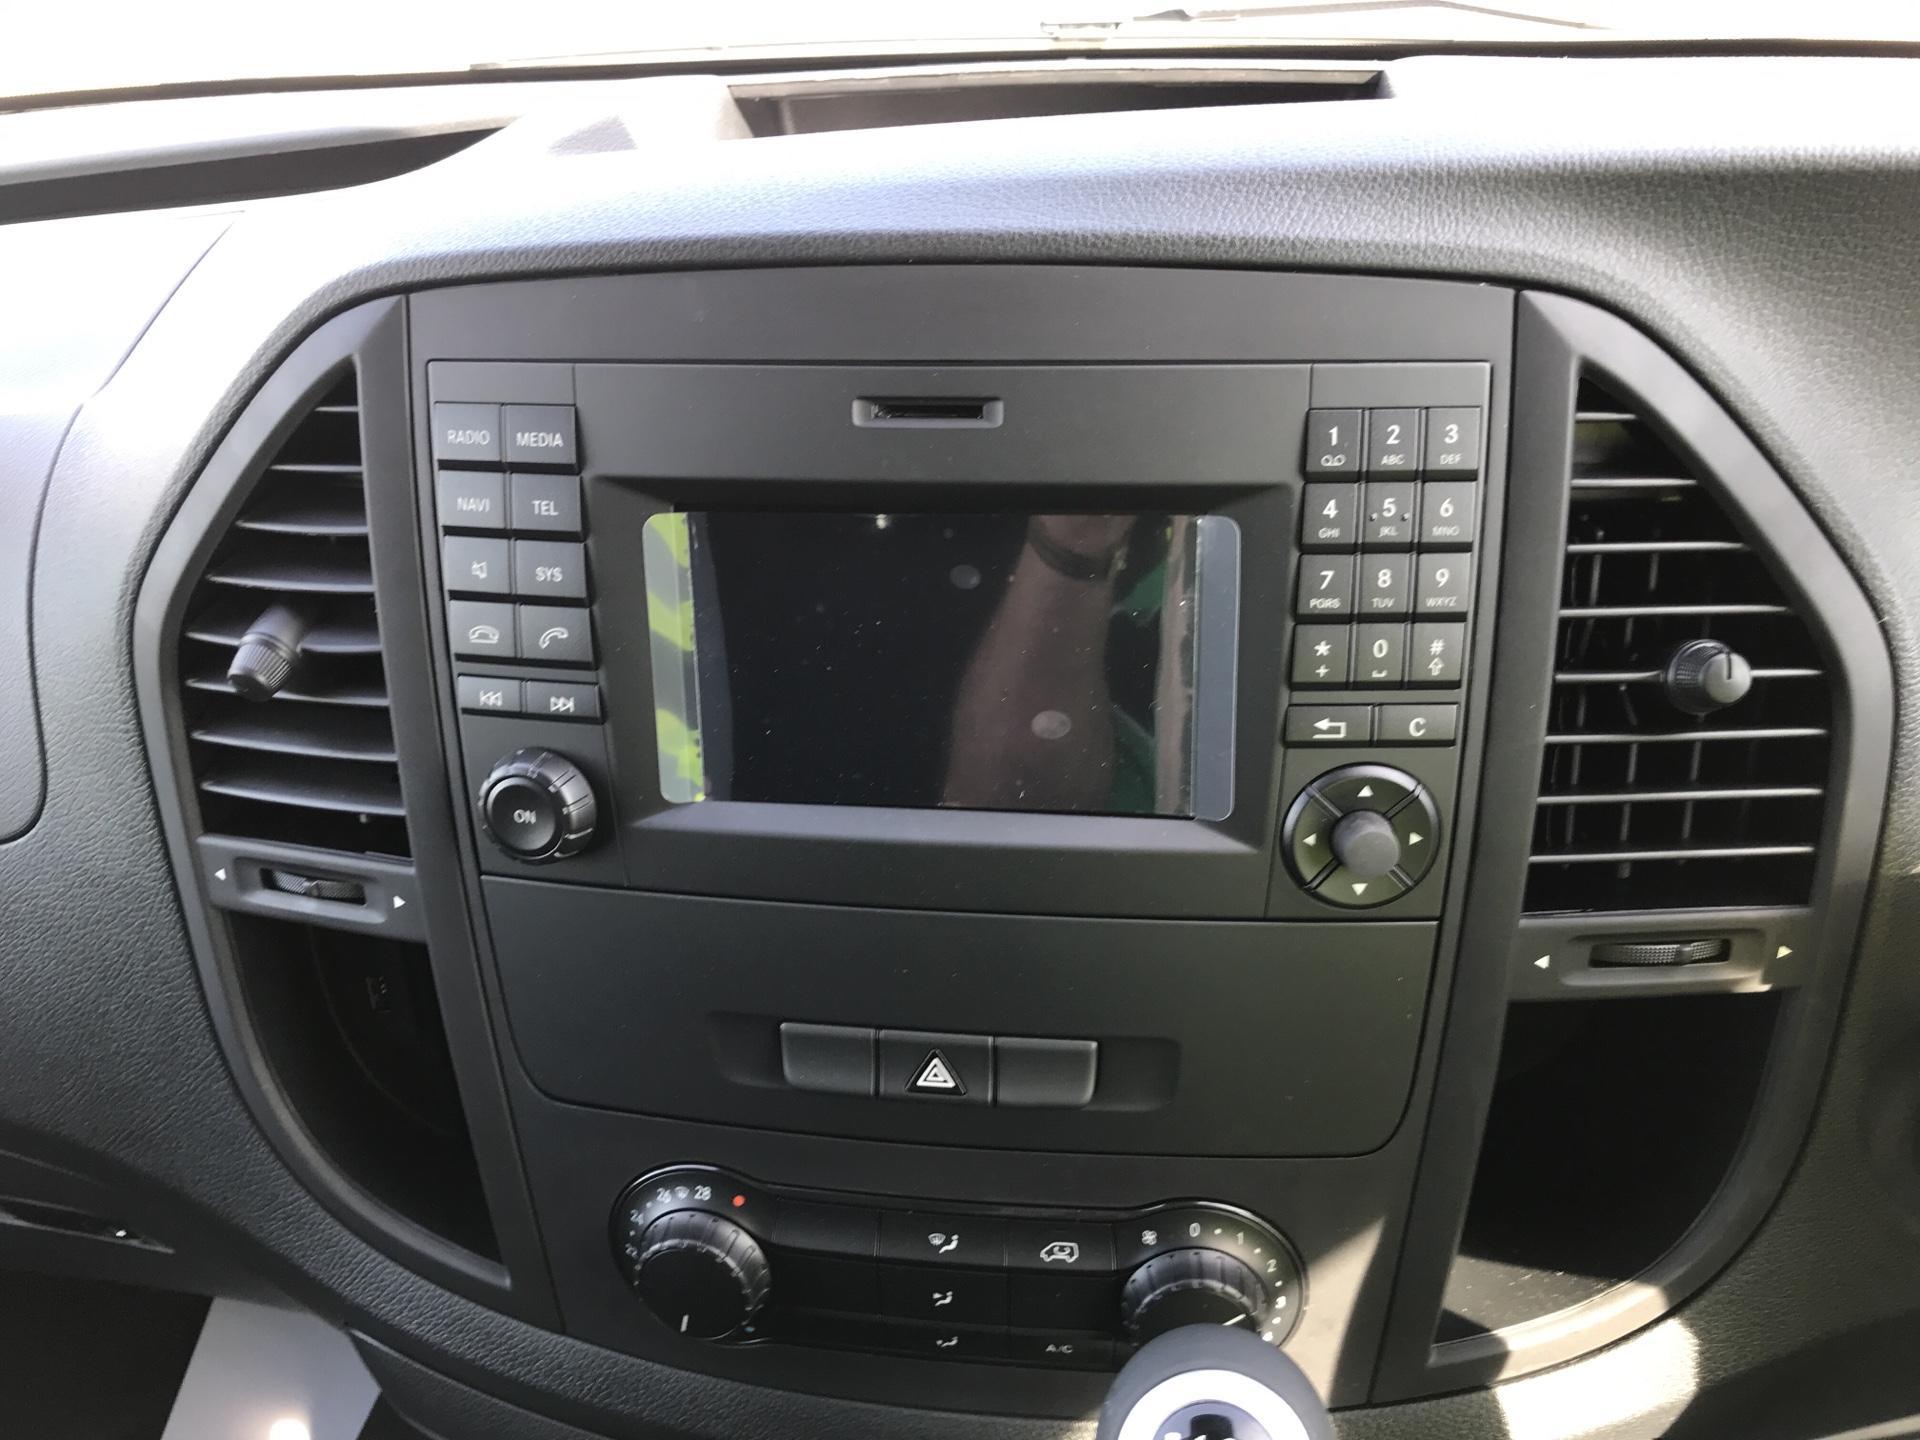 2019 Mercedes-Benz Vito 111Cdi Van Euro 6 Massive Specification A/C (YN19ZFJ) Image 10